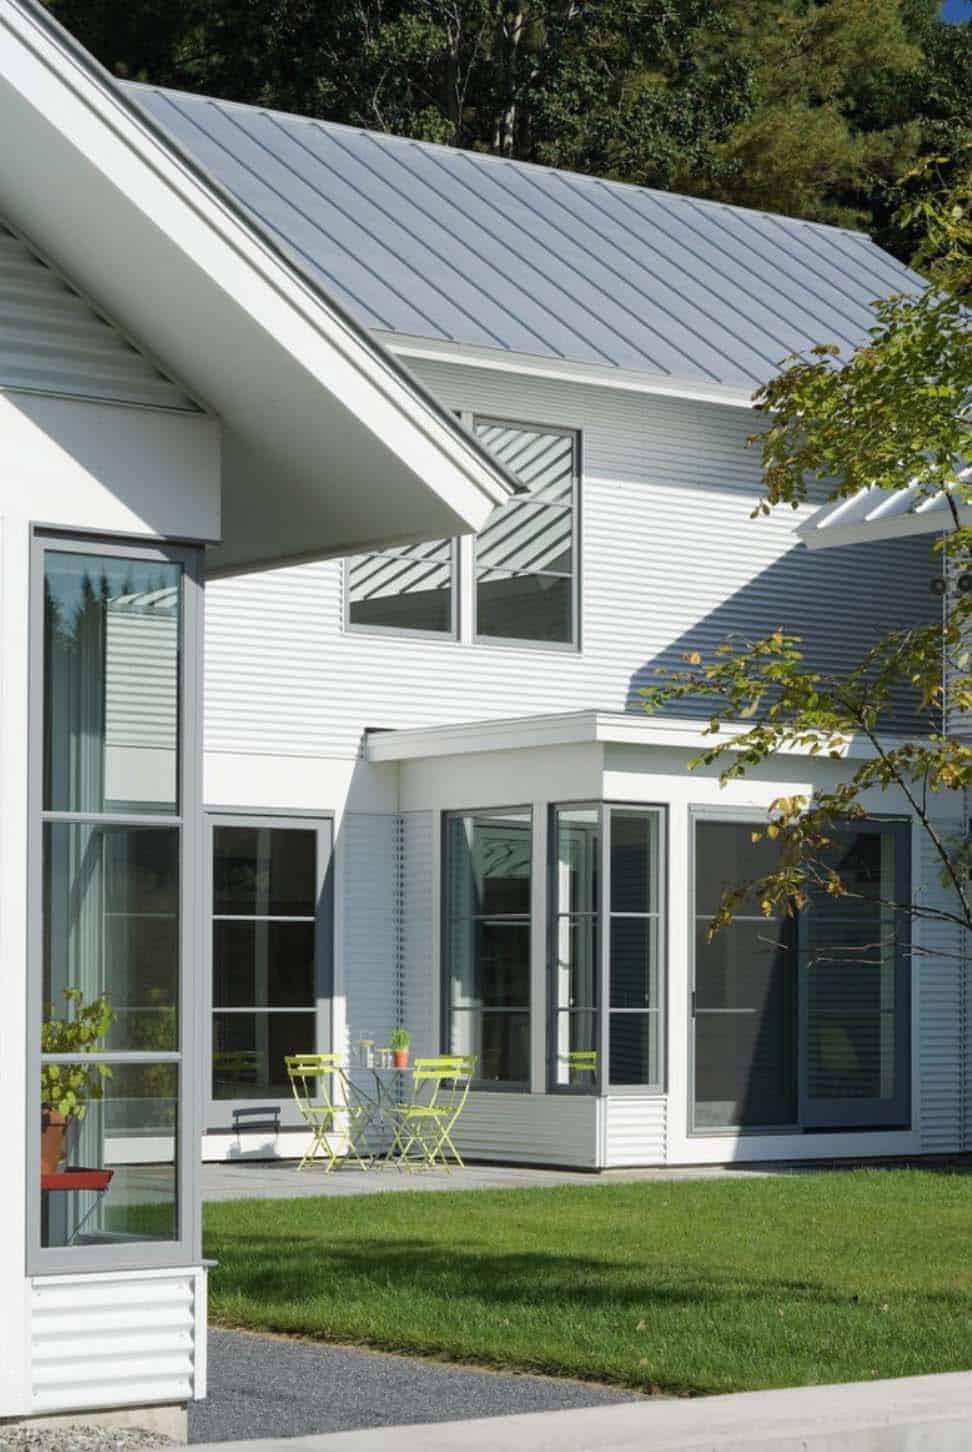 Modern Farm House-TruexCullins Architecture-05-1 Kindesign